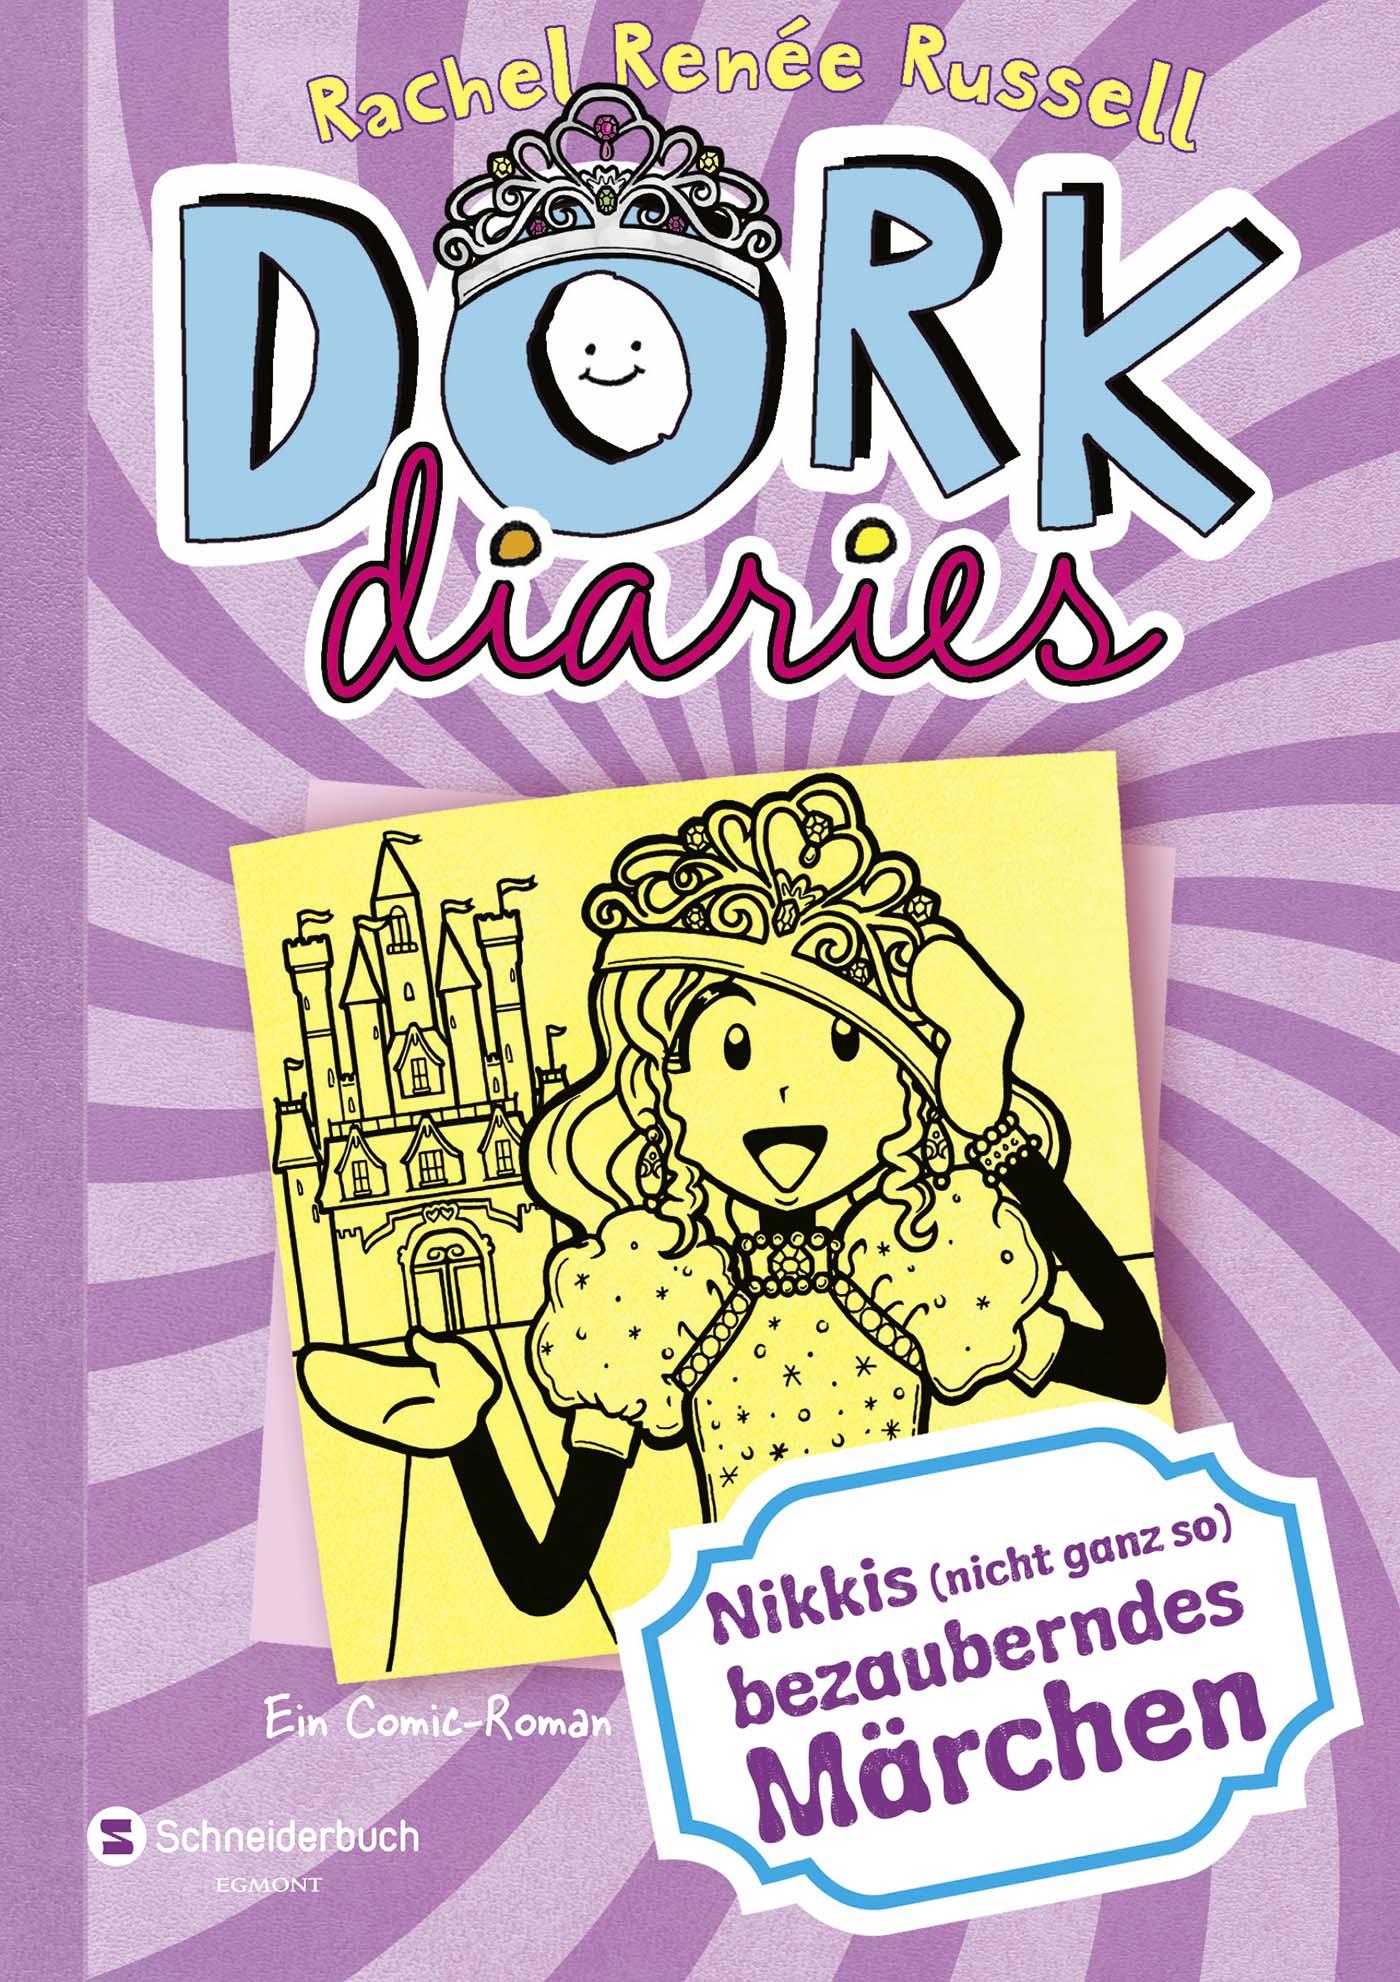 DORK Diaries: Band 8 - Nikkis (nicht ganz so) bezauberndes Märchen - Rachel Renée Russell